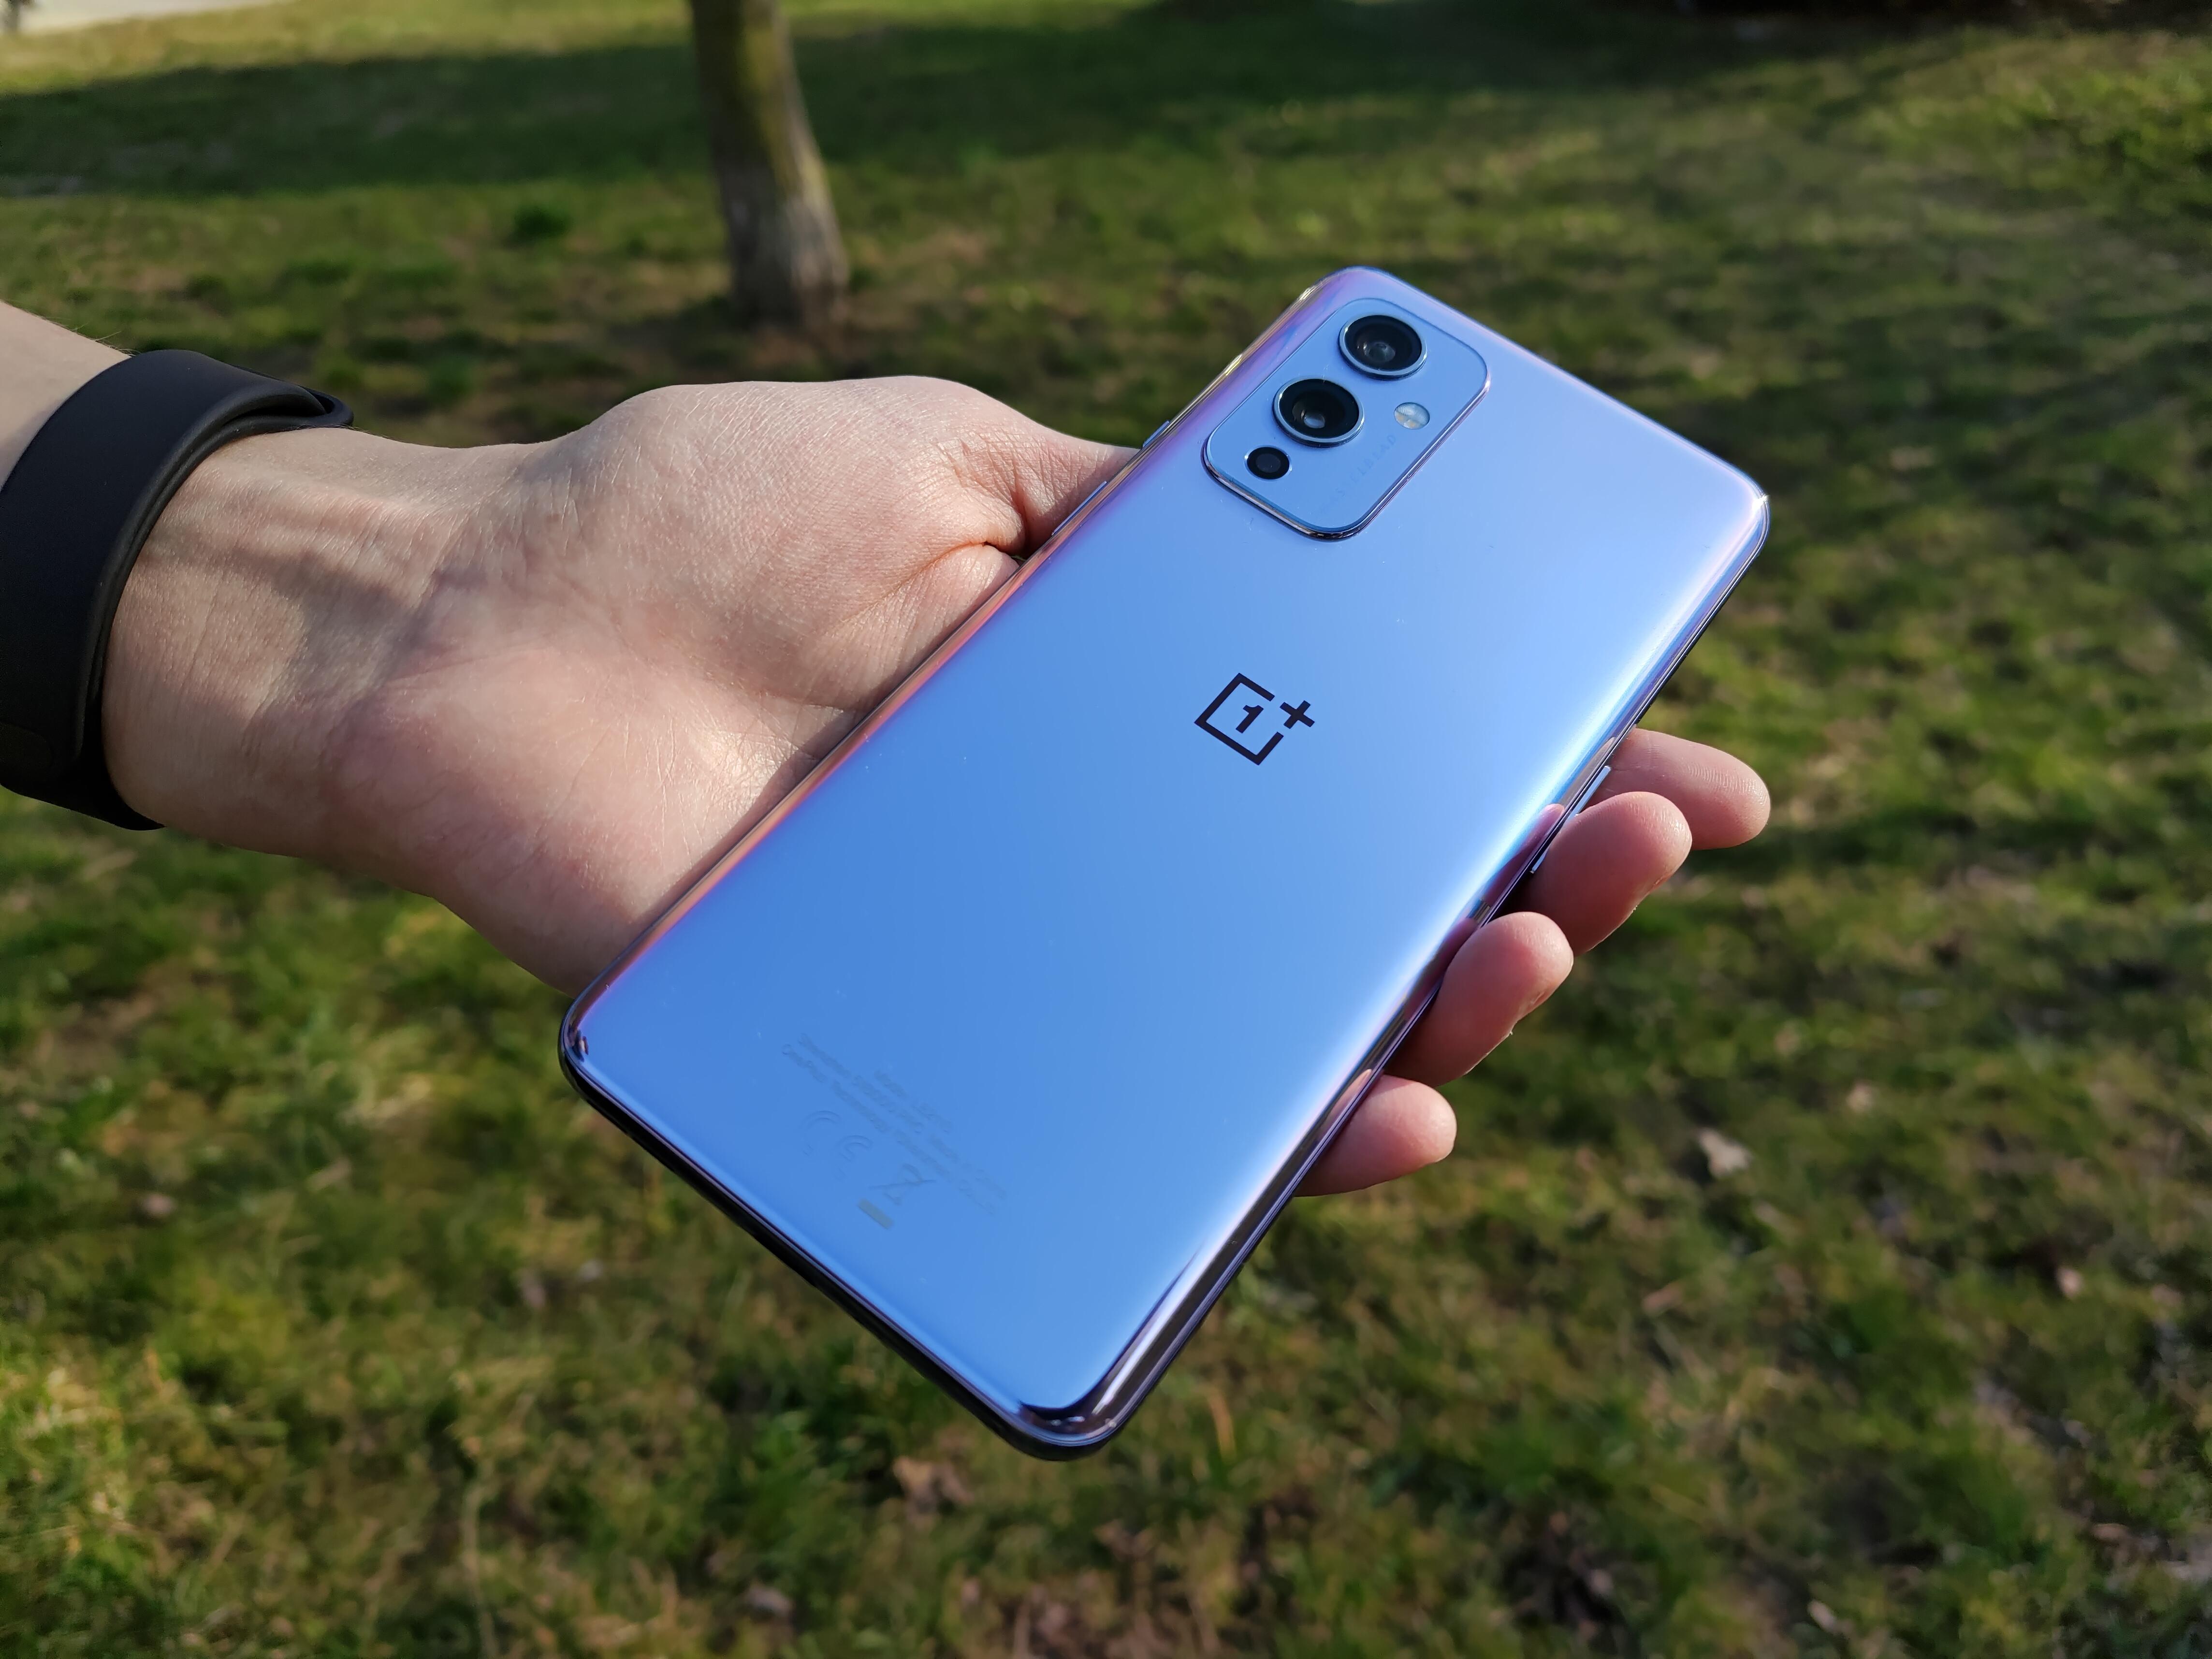 smartfon OnePlus 9 5G smartphone Tabletowo